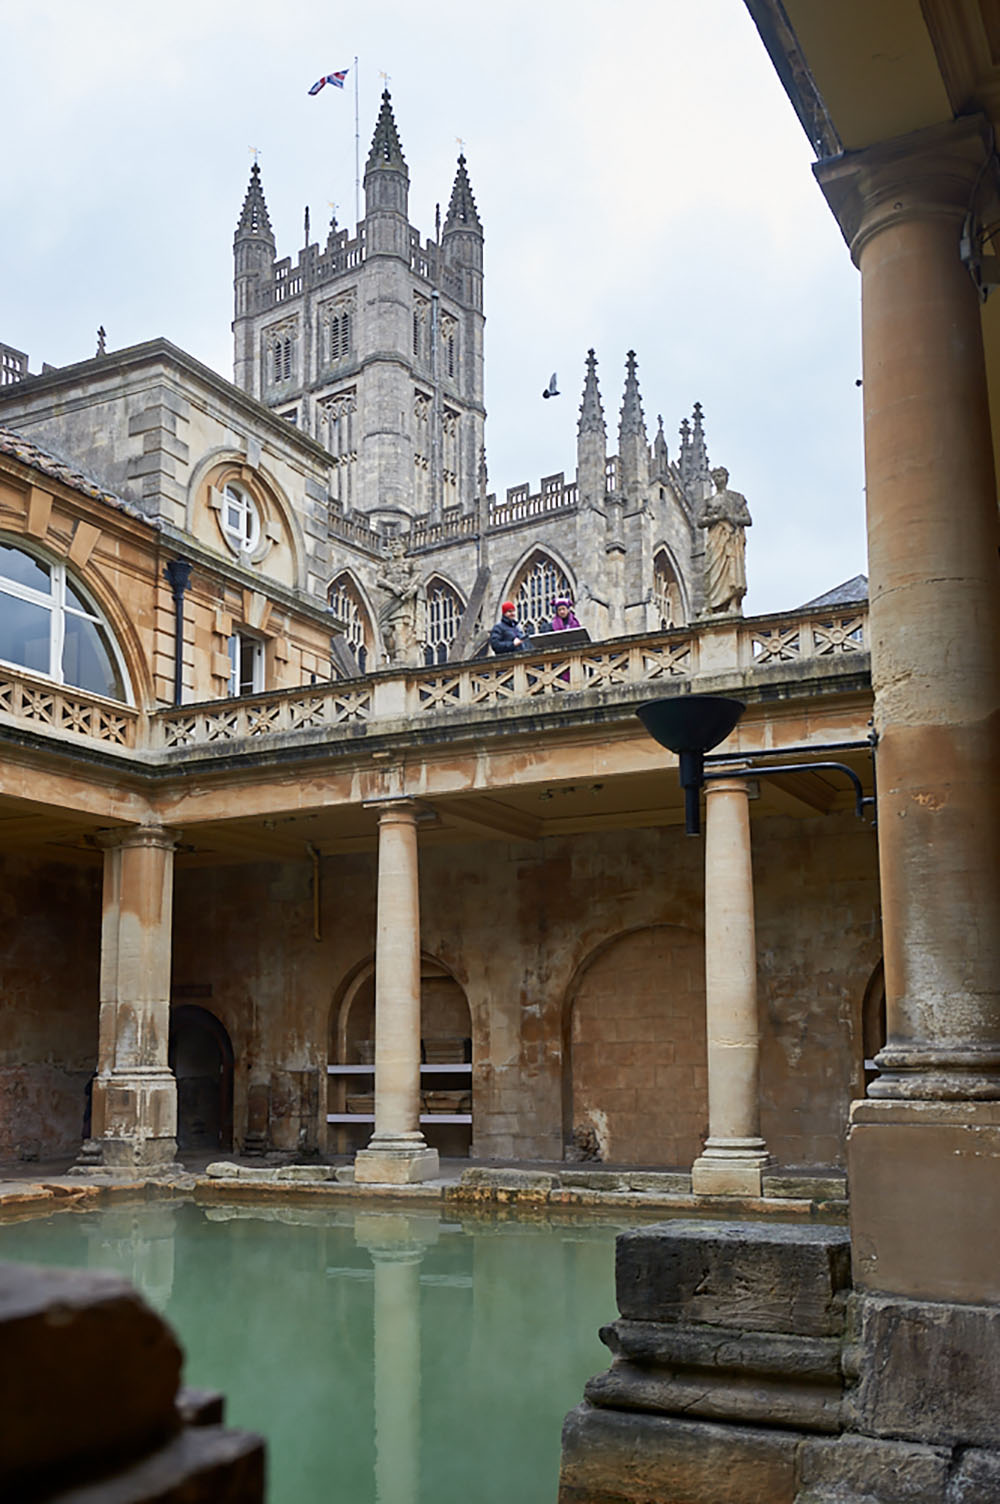 roman baths, bath, somerset, uk, travel, holiday, spa, photos and the city